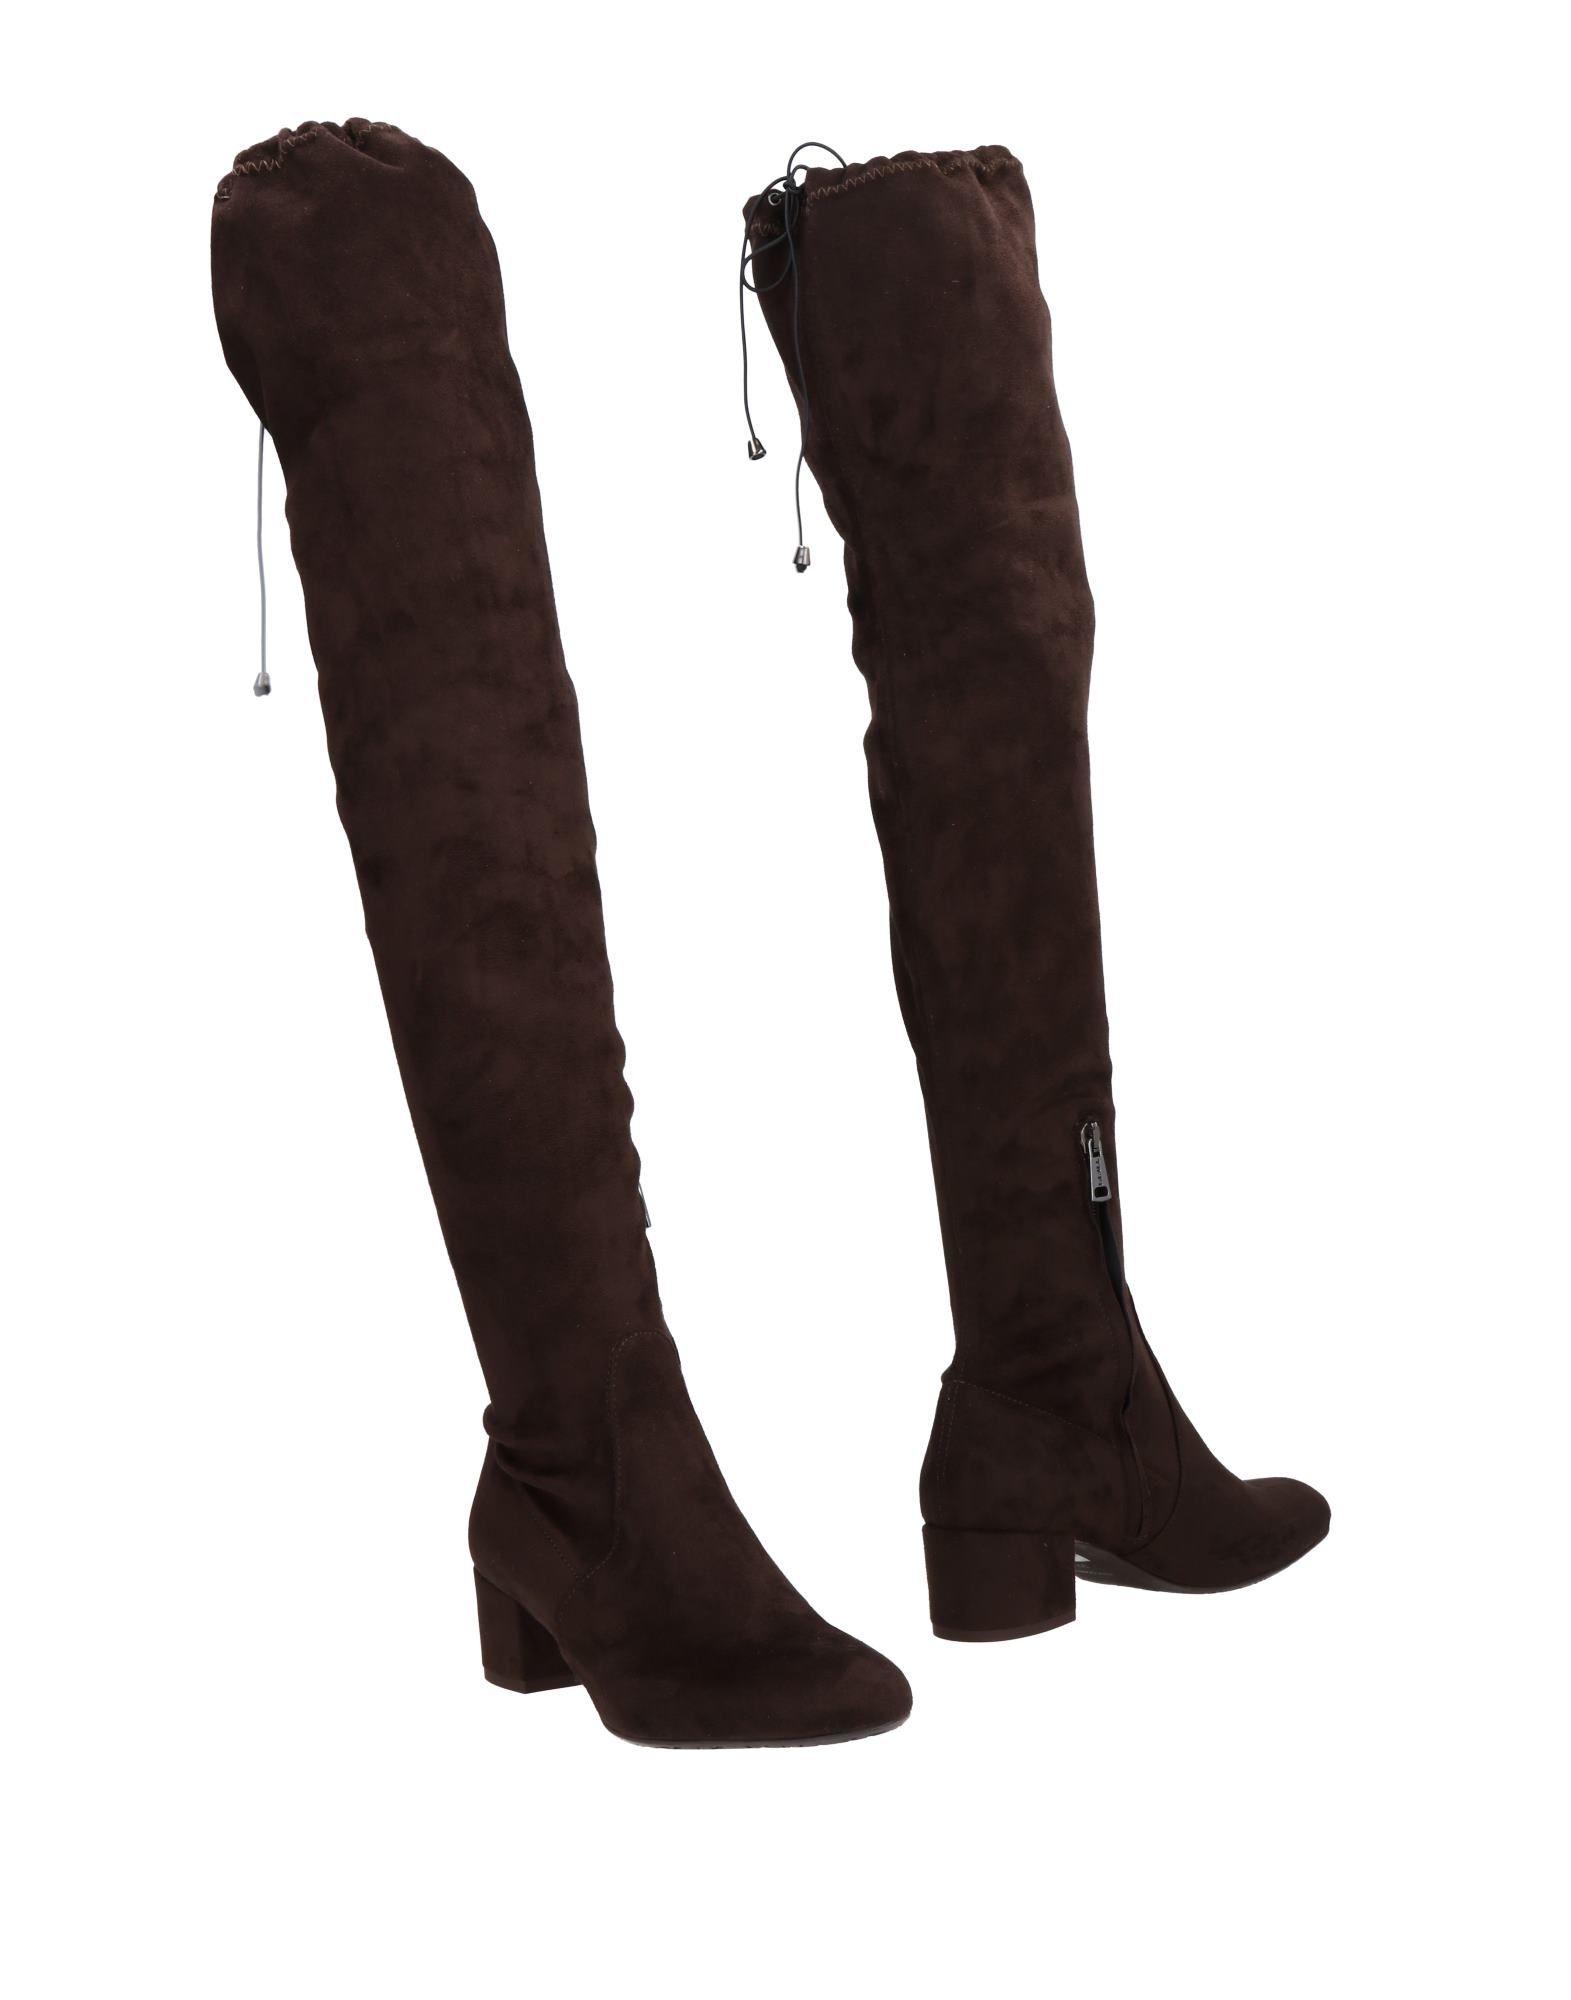 Tiffi 11501890OA Stiefel Damen  11501890OA Tiffi Gute Qualität beliebte Schuhe 396e84